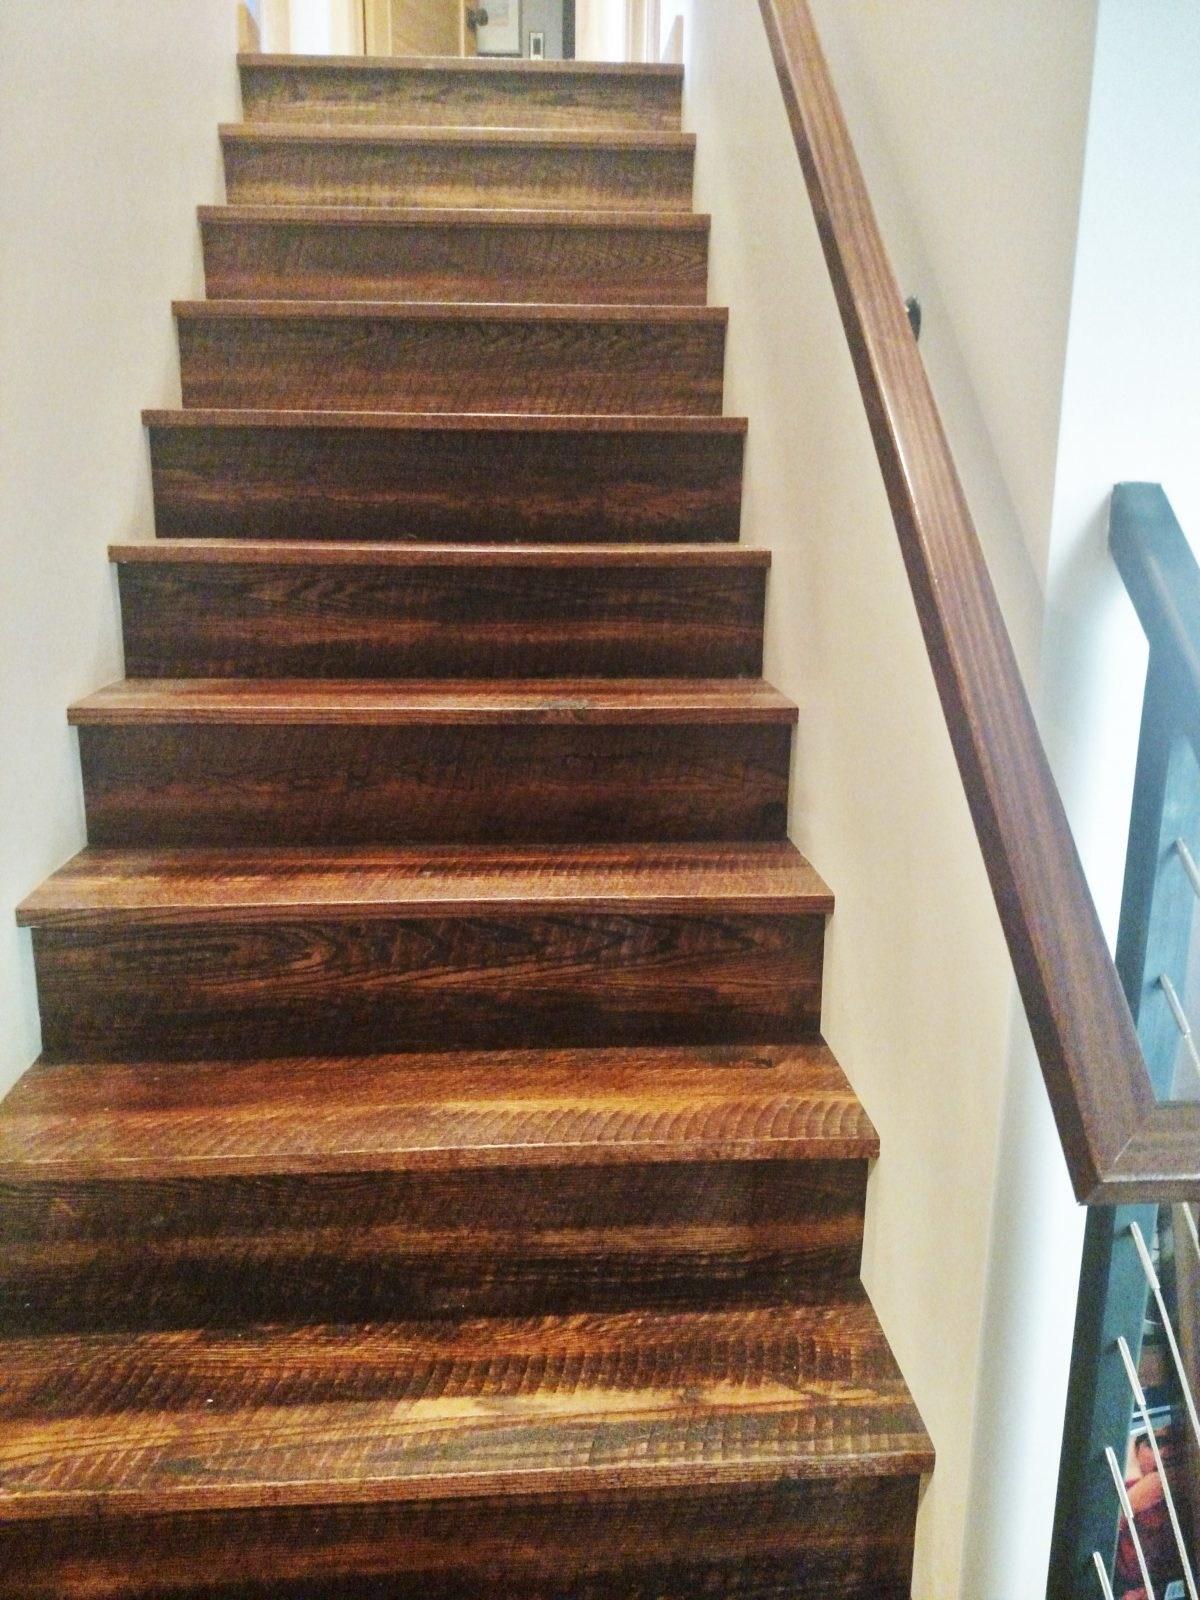 Rustic Red Oak Stair Treads And Risers – Bingham Lumber   Buy Oak Stair Treads   Flooring   Wood Stair   Hardwood Flooring   Risers   Red Oak